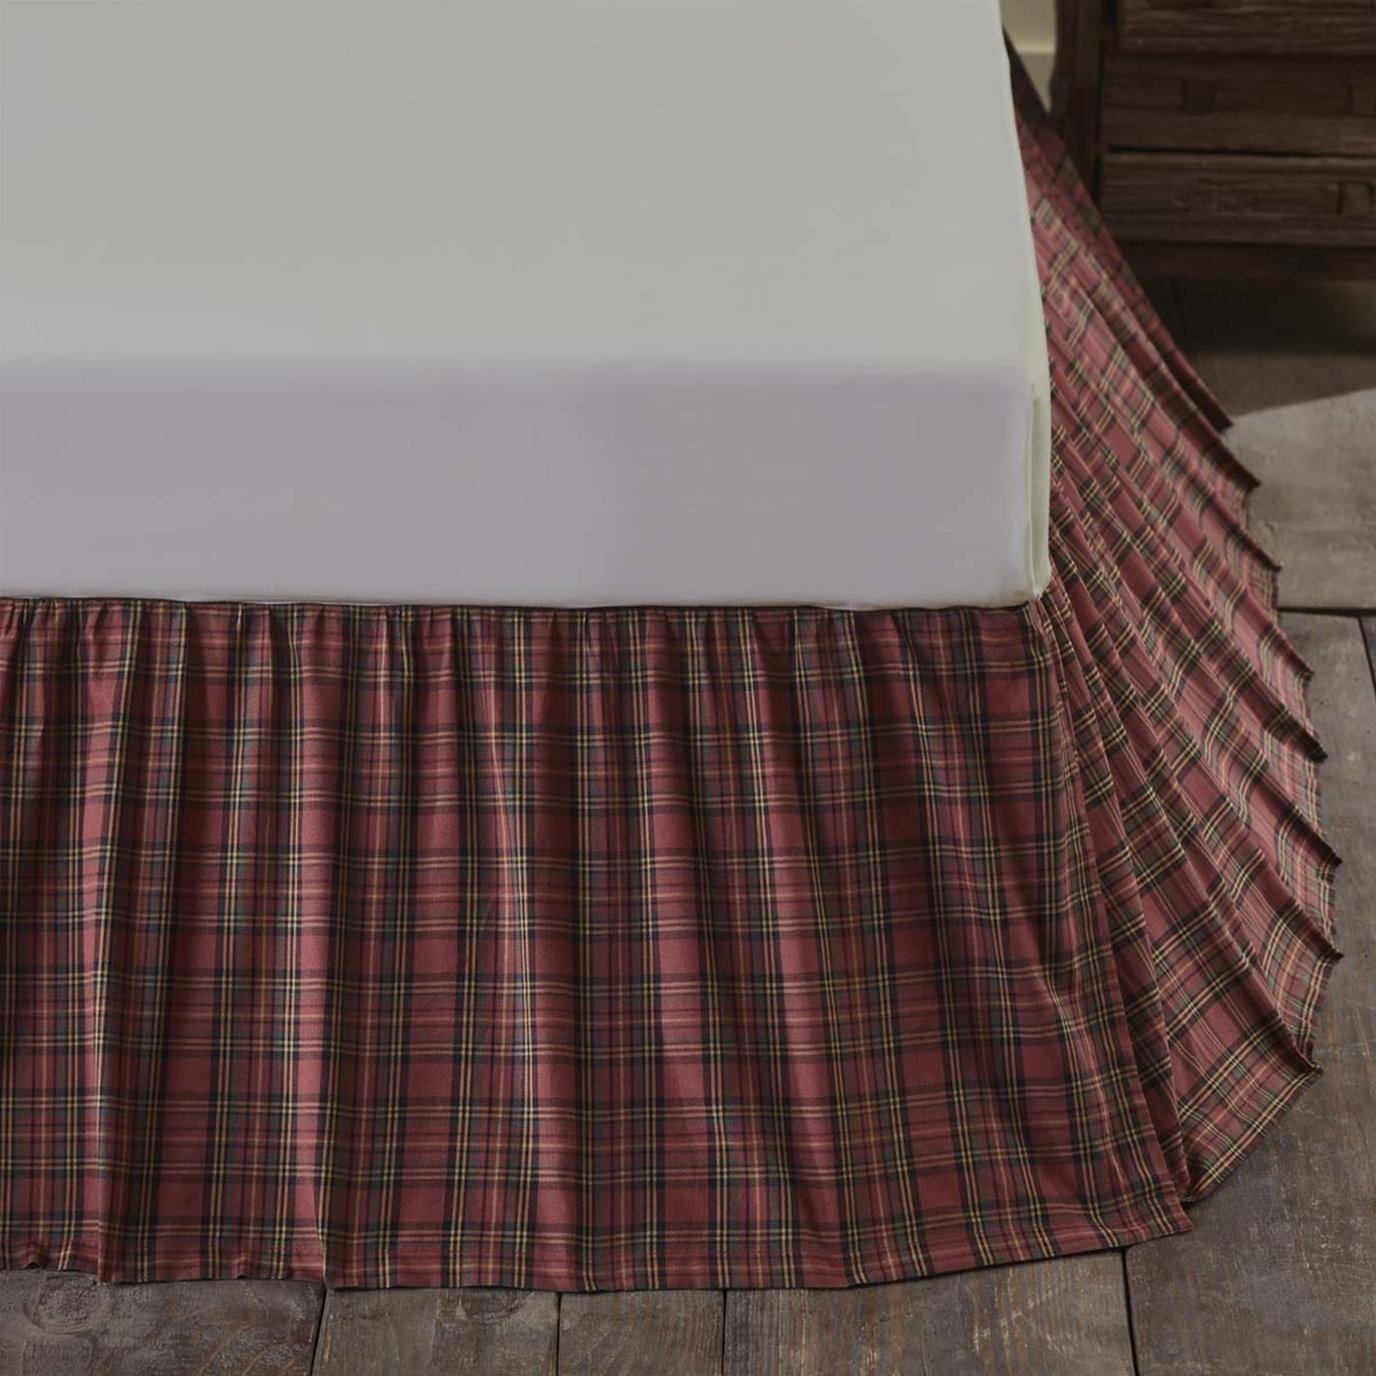 Tartan Red Plaid King Bed Skirt 78x80x16